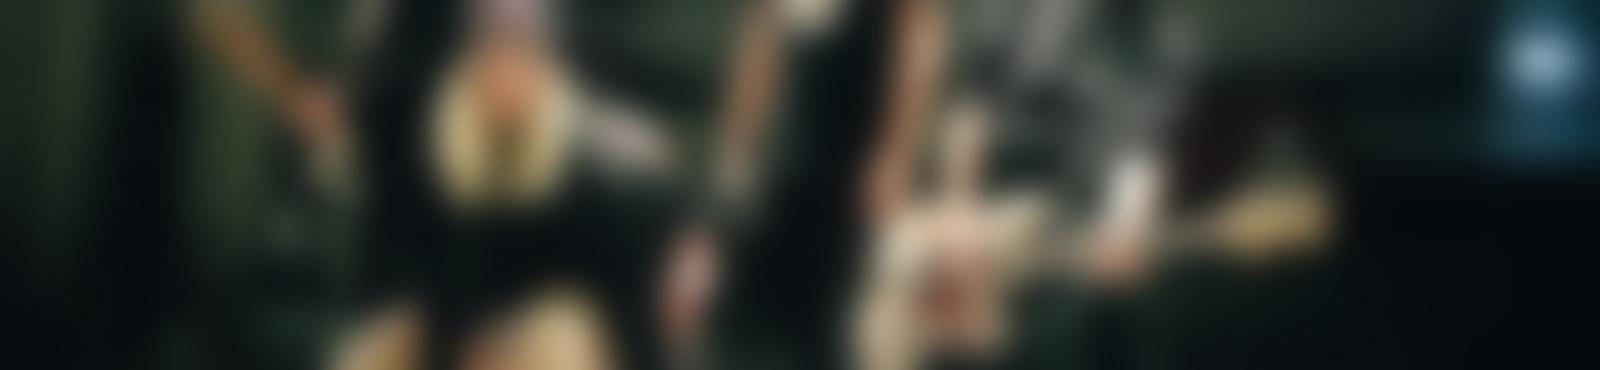 Blurred 59700195 a709 4af2 bbdc f667d205a515